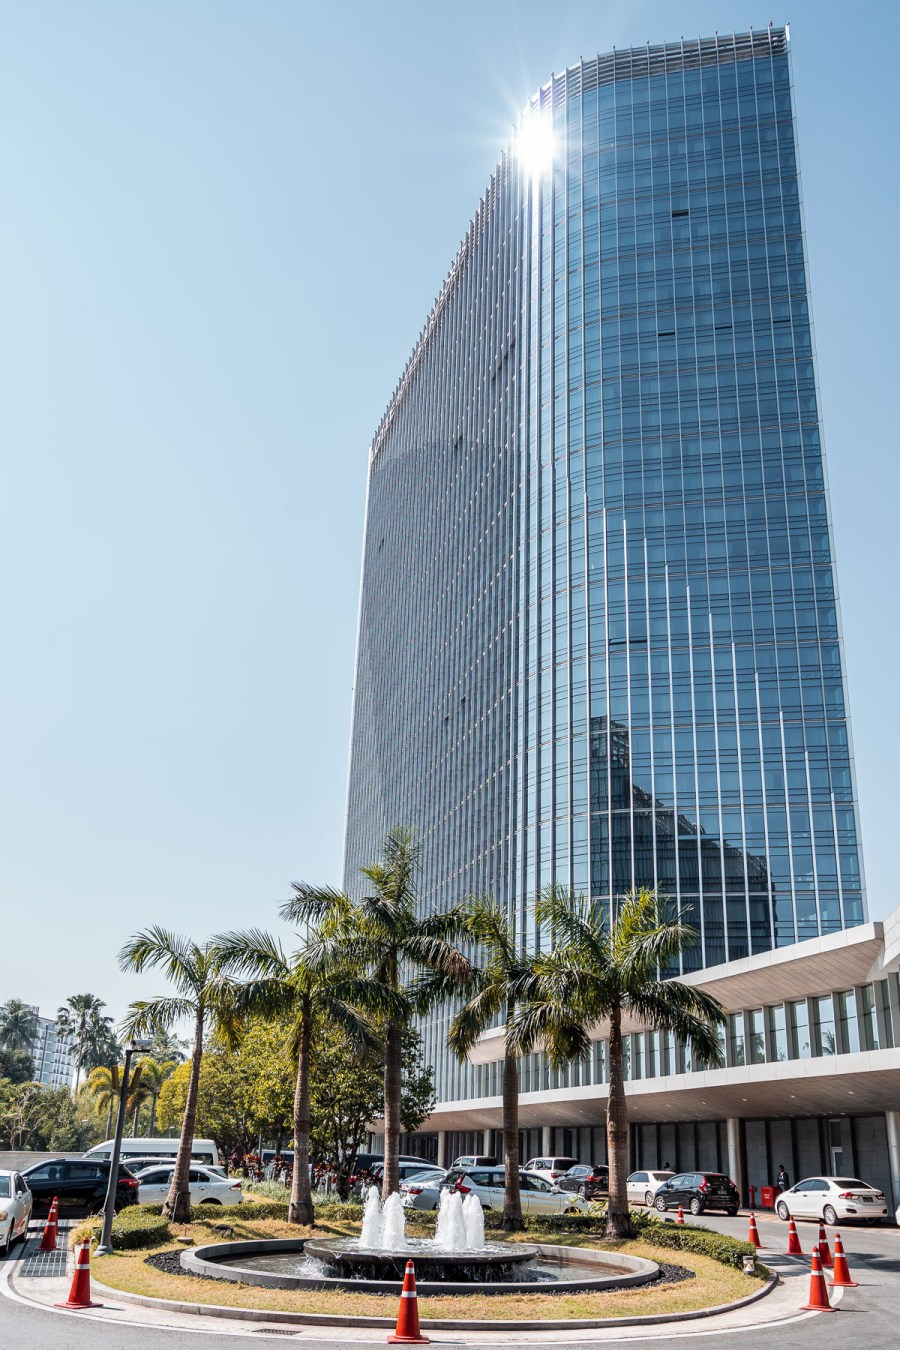 The beautiful building of Lotte Hotel Yangon